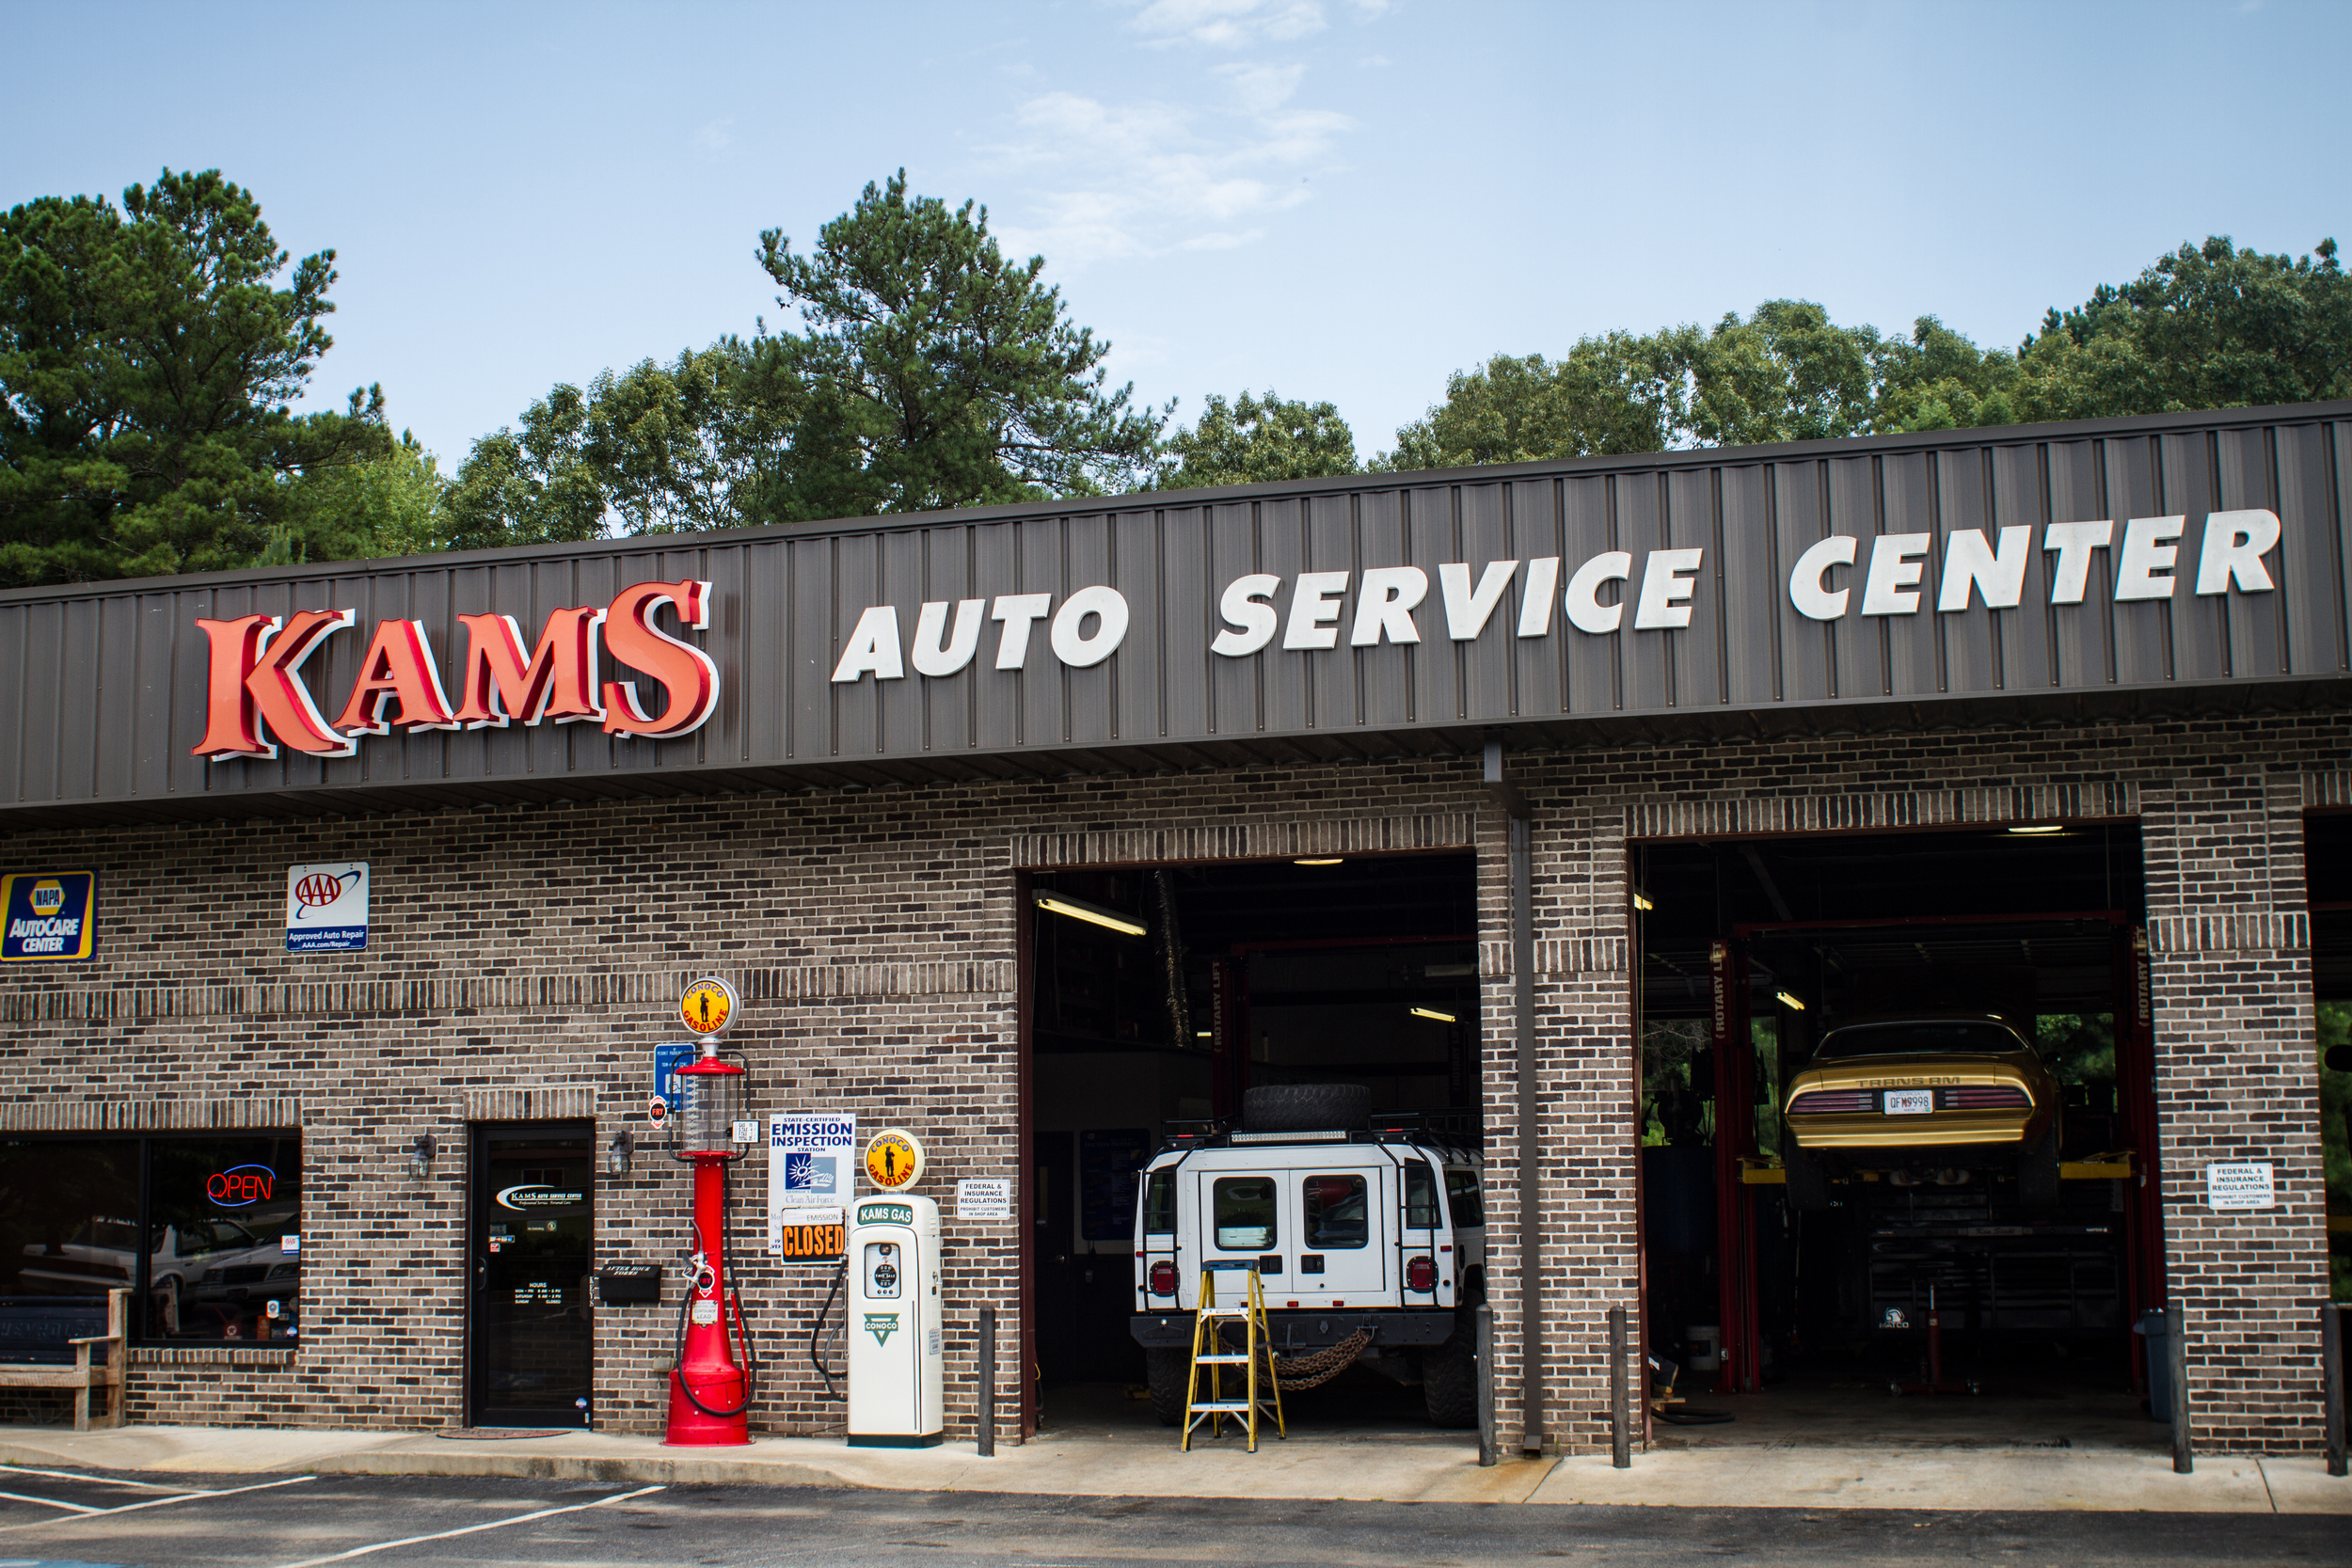 Kam's Auto Service Center 07.13.2016-25 PS.jpg